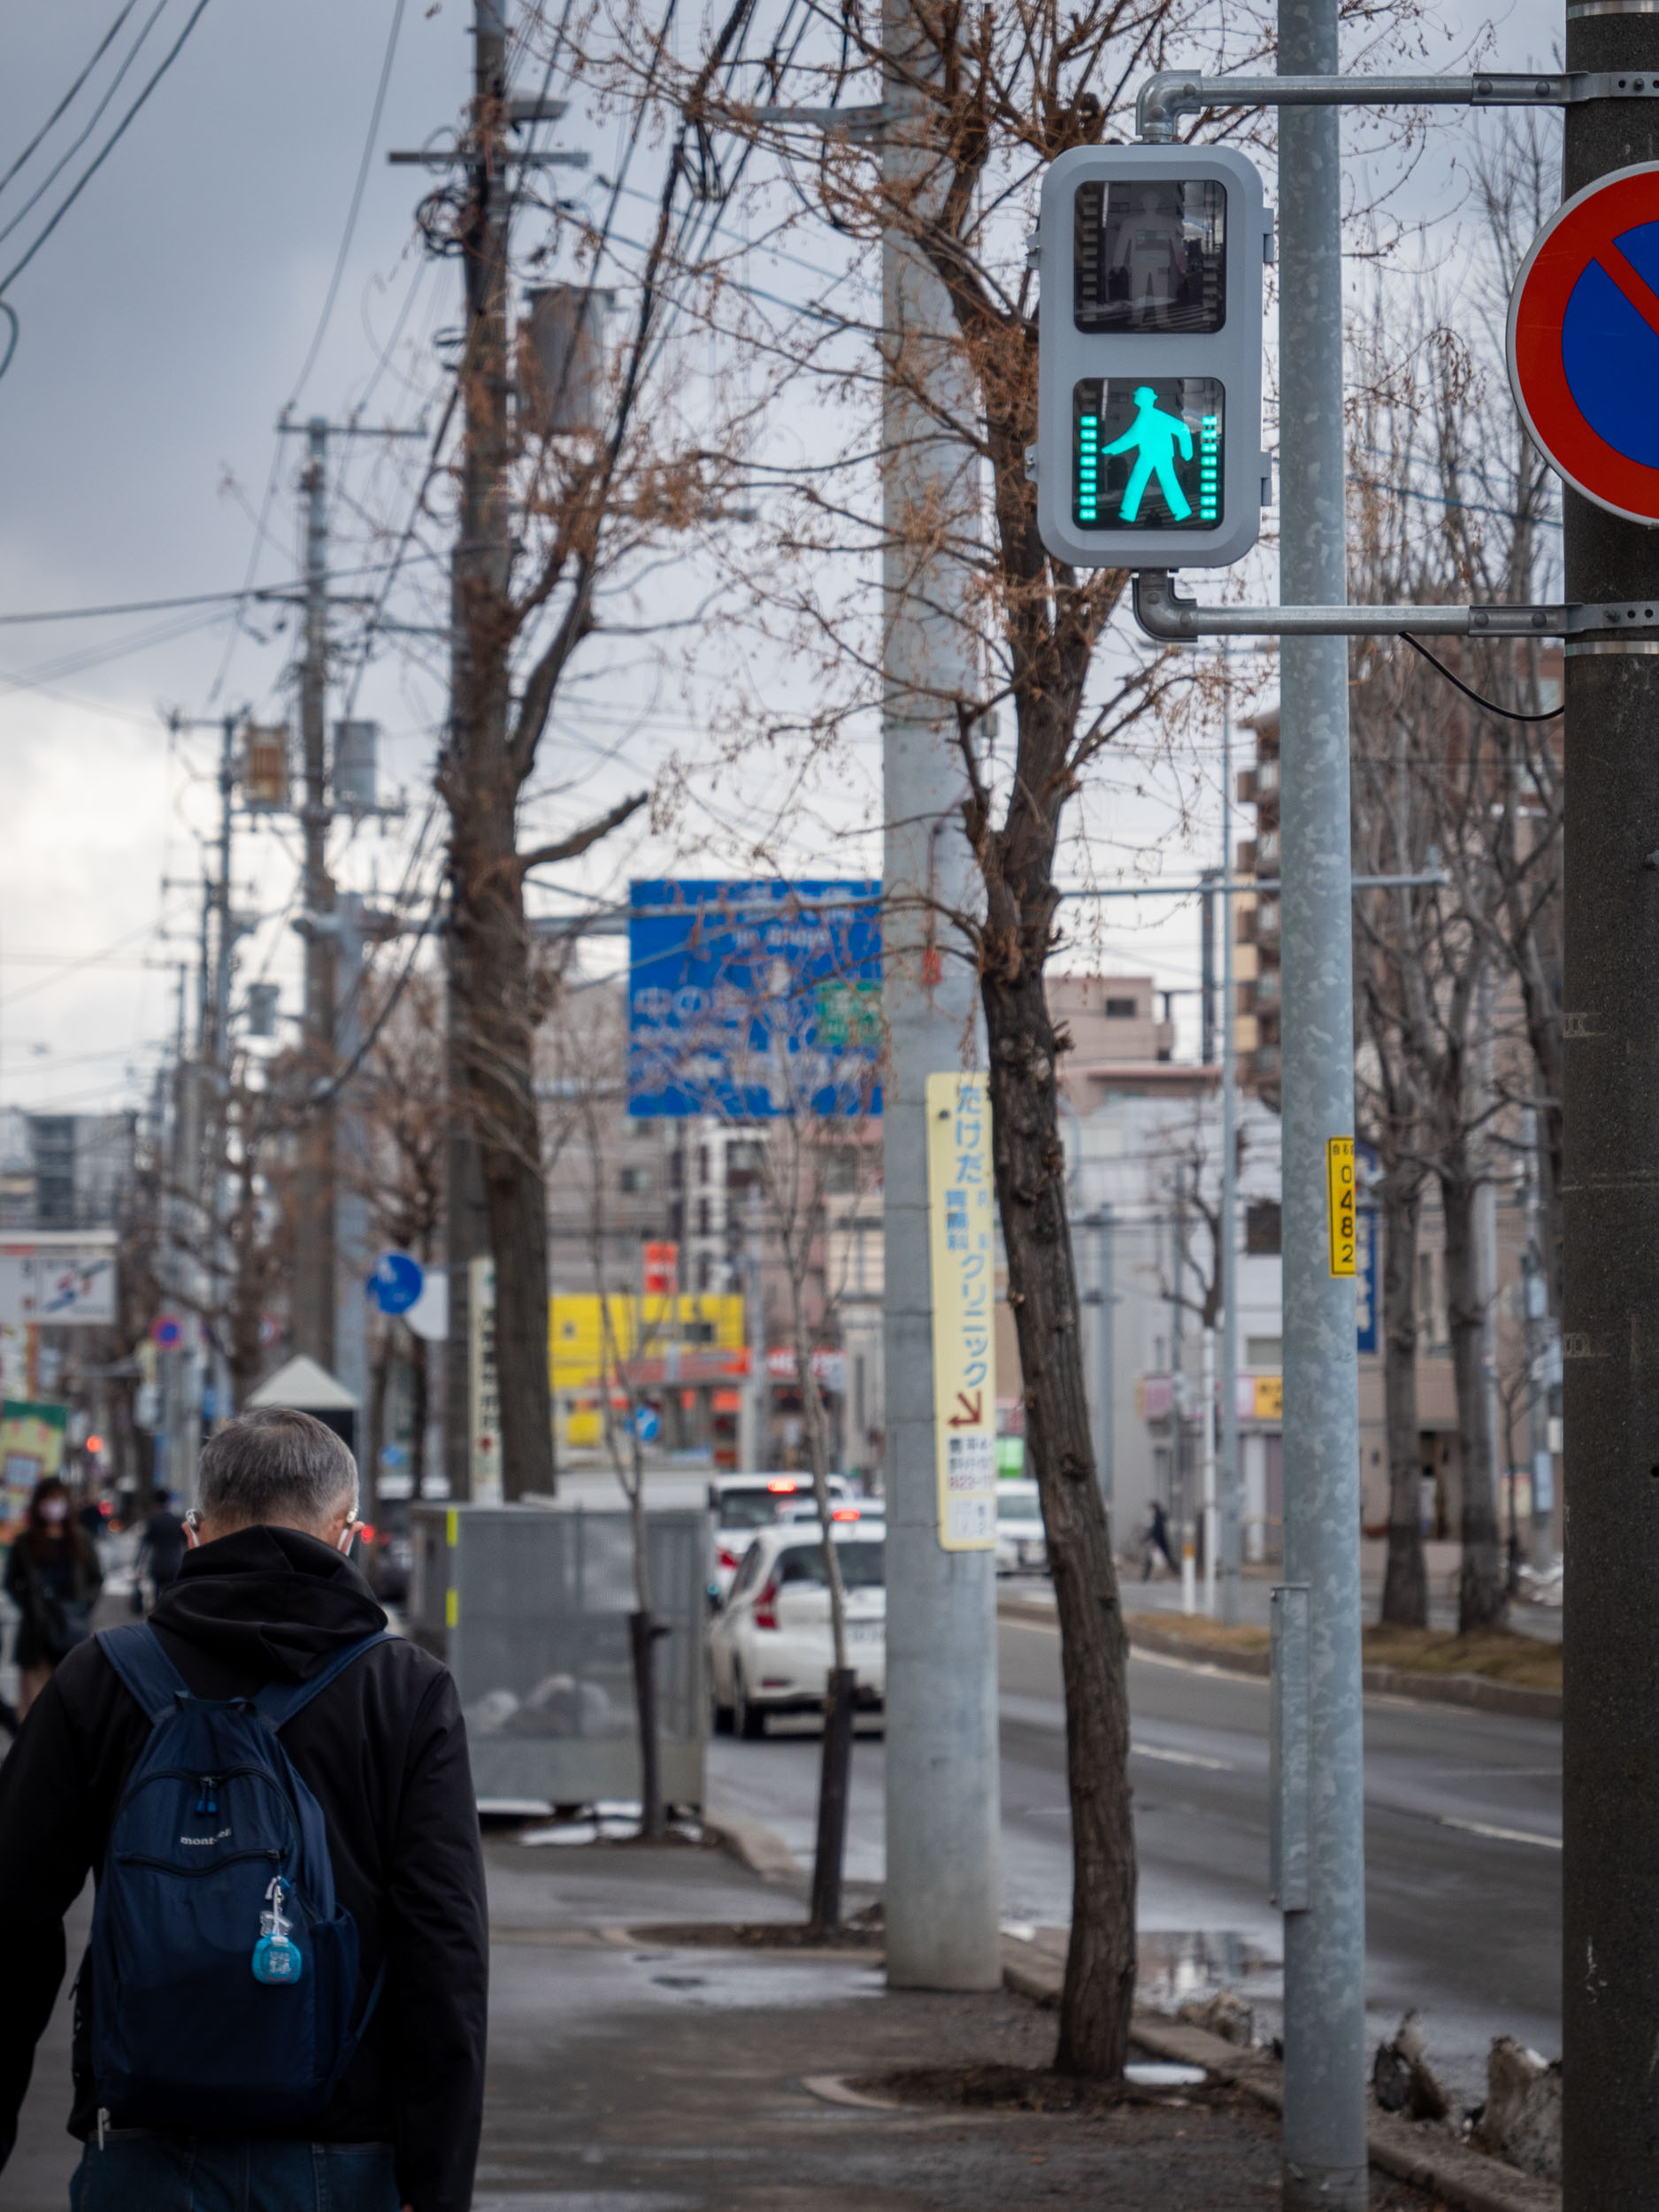 札幌市白石区菊水1条付近のタイマー付横断歩道 DMC-GX8 + LEICA DG 12-60mm